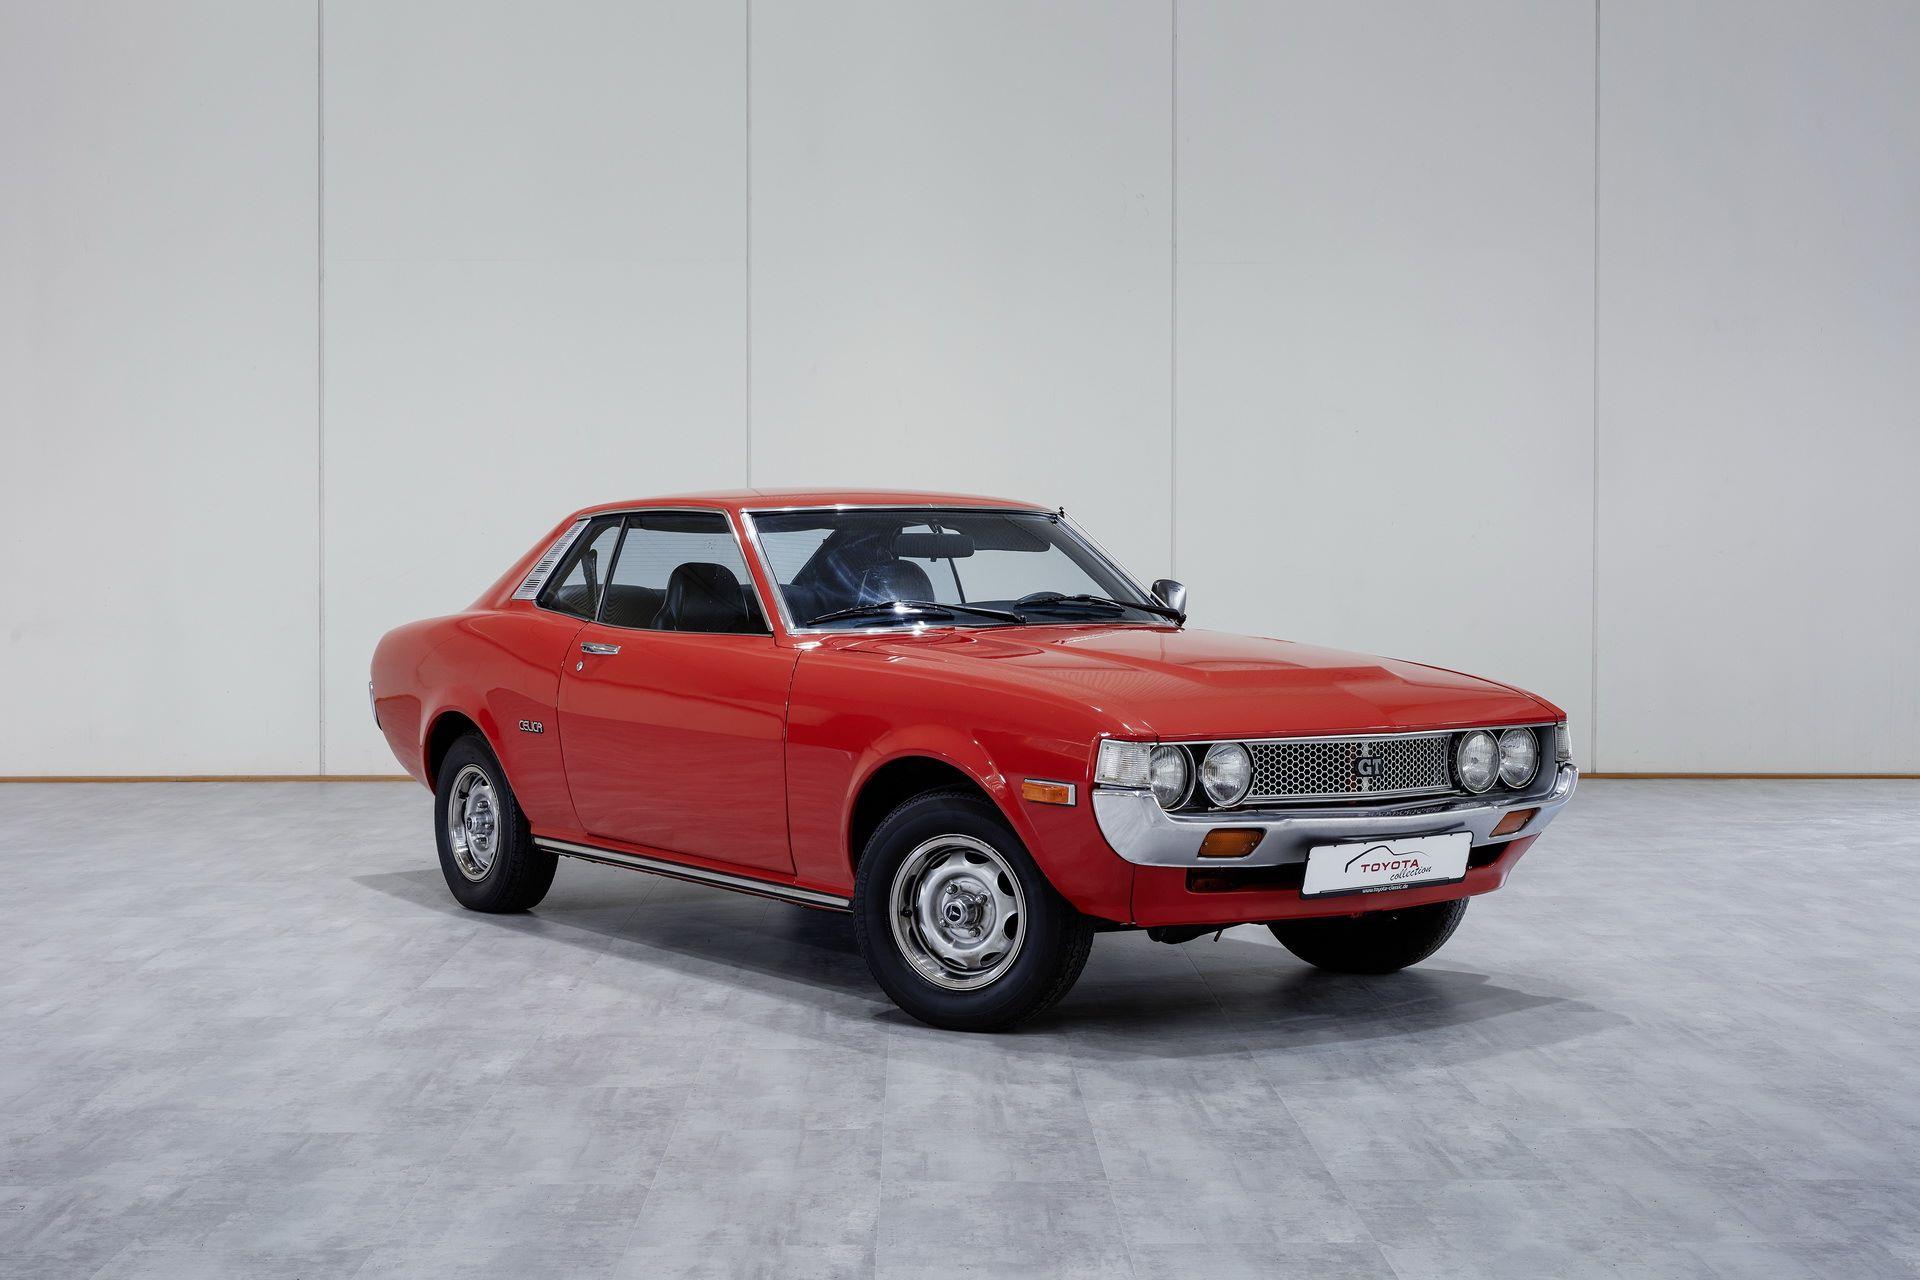 Toyota-Celica-50-years-11